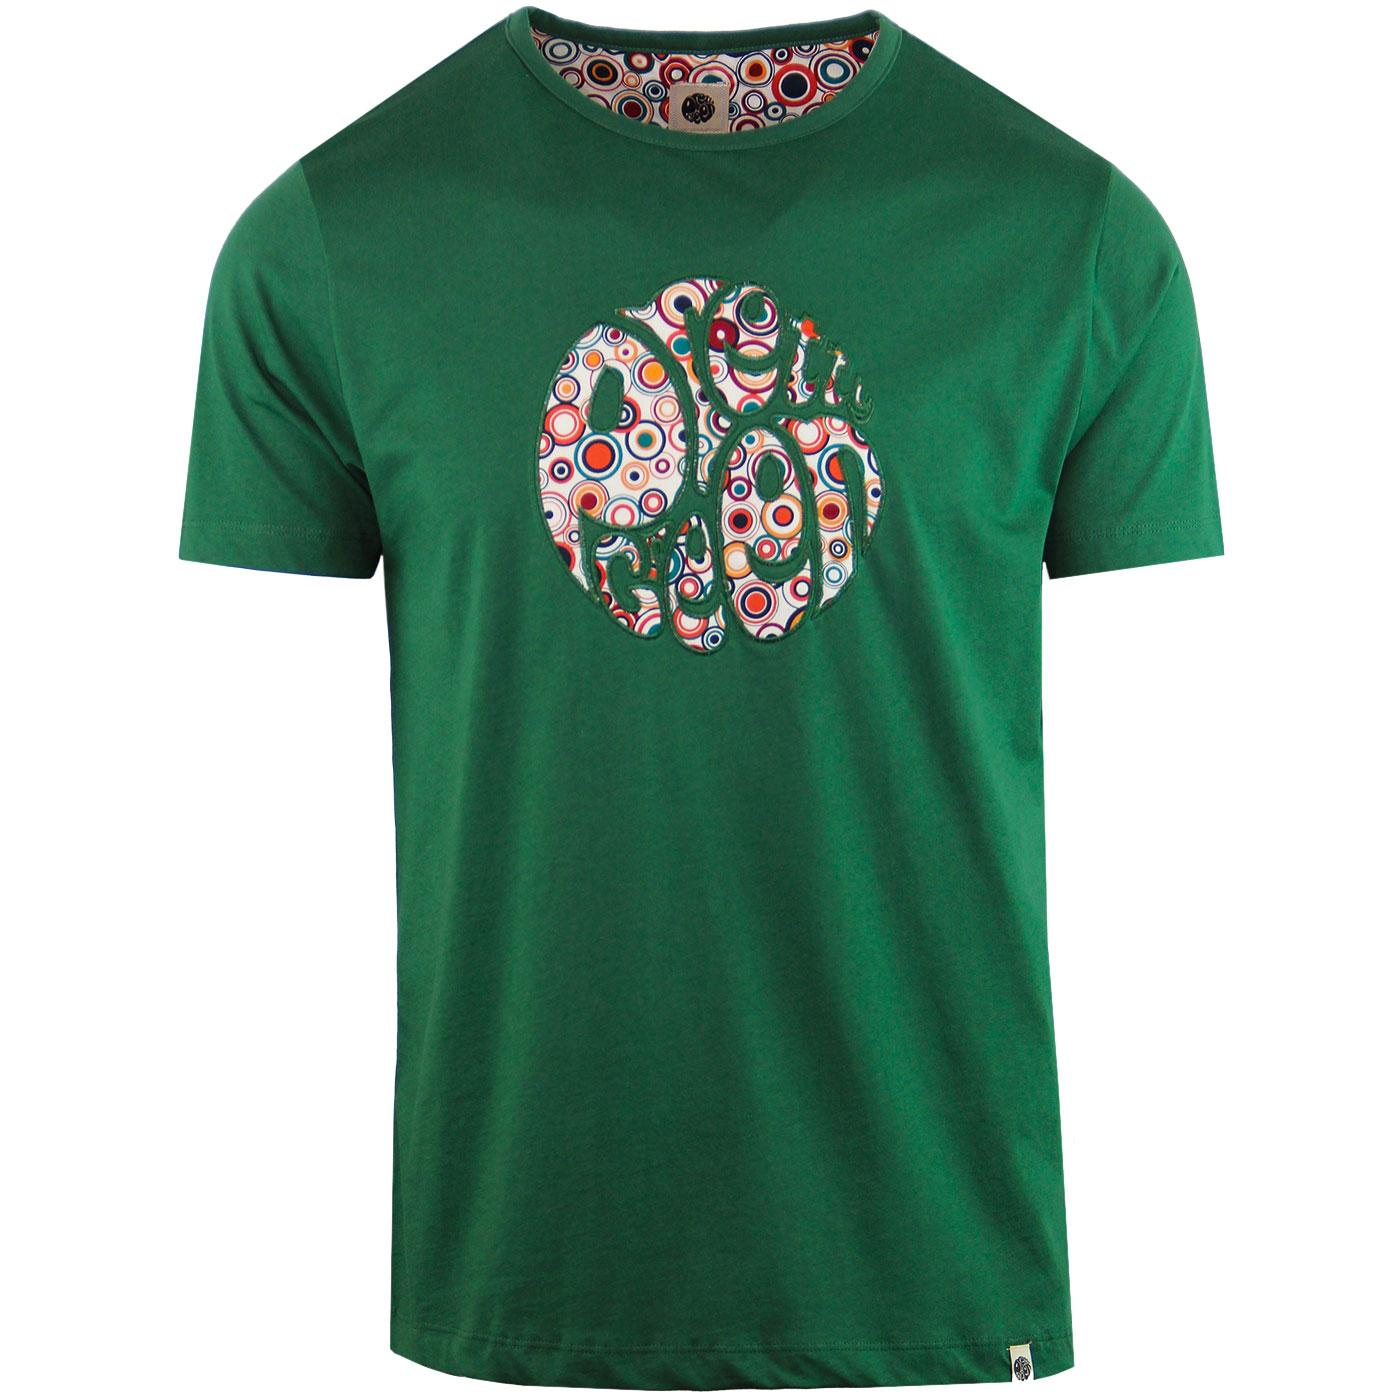 PRETTY GREEN Applique Target Logo Print Tee (G)